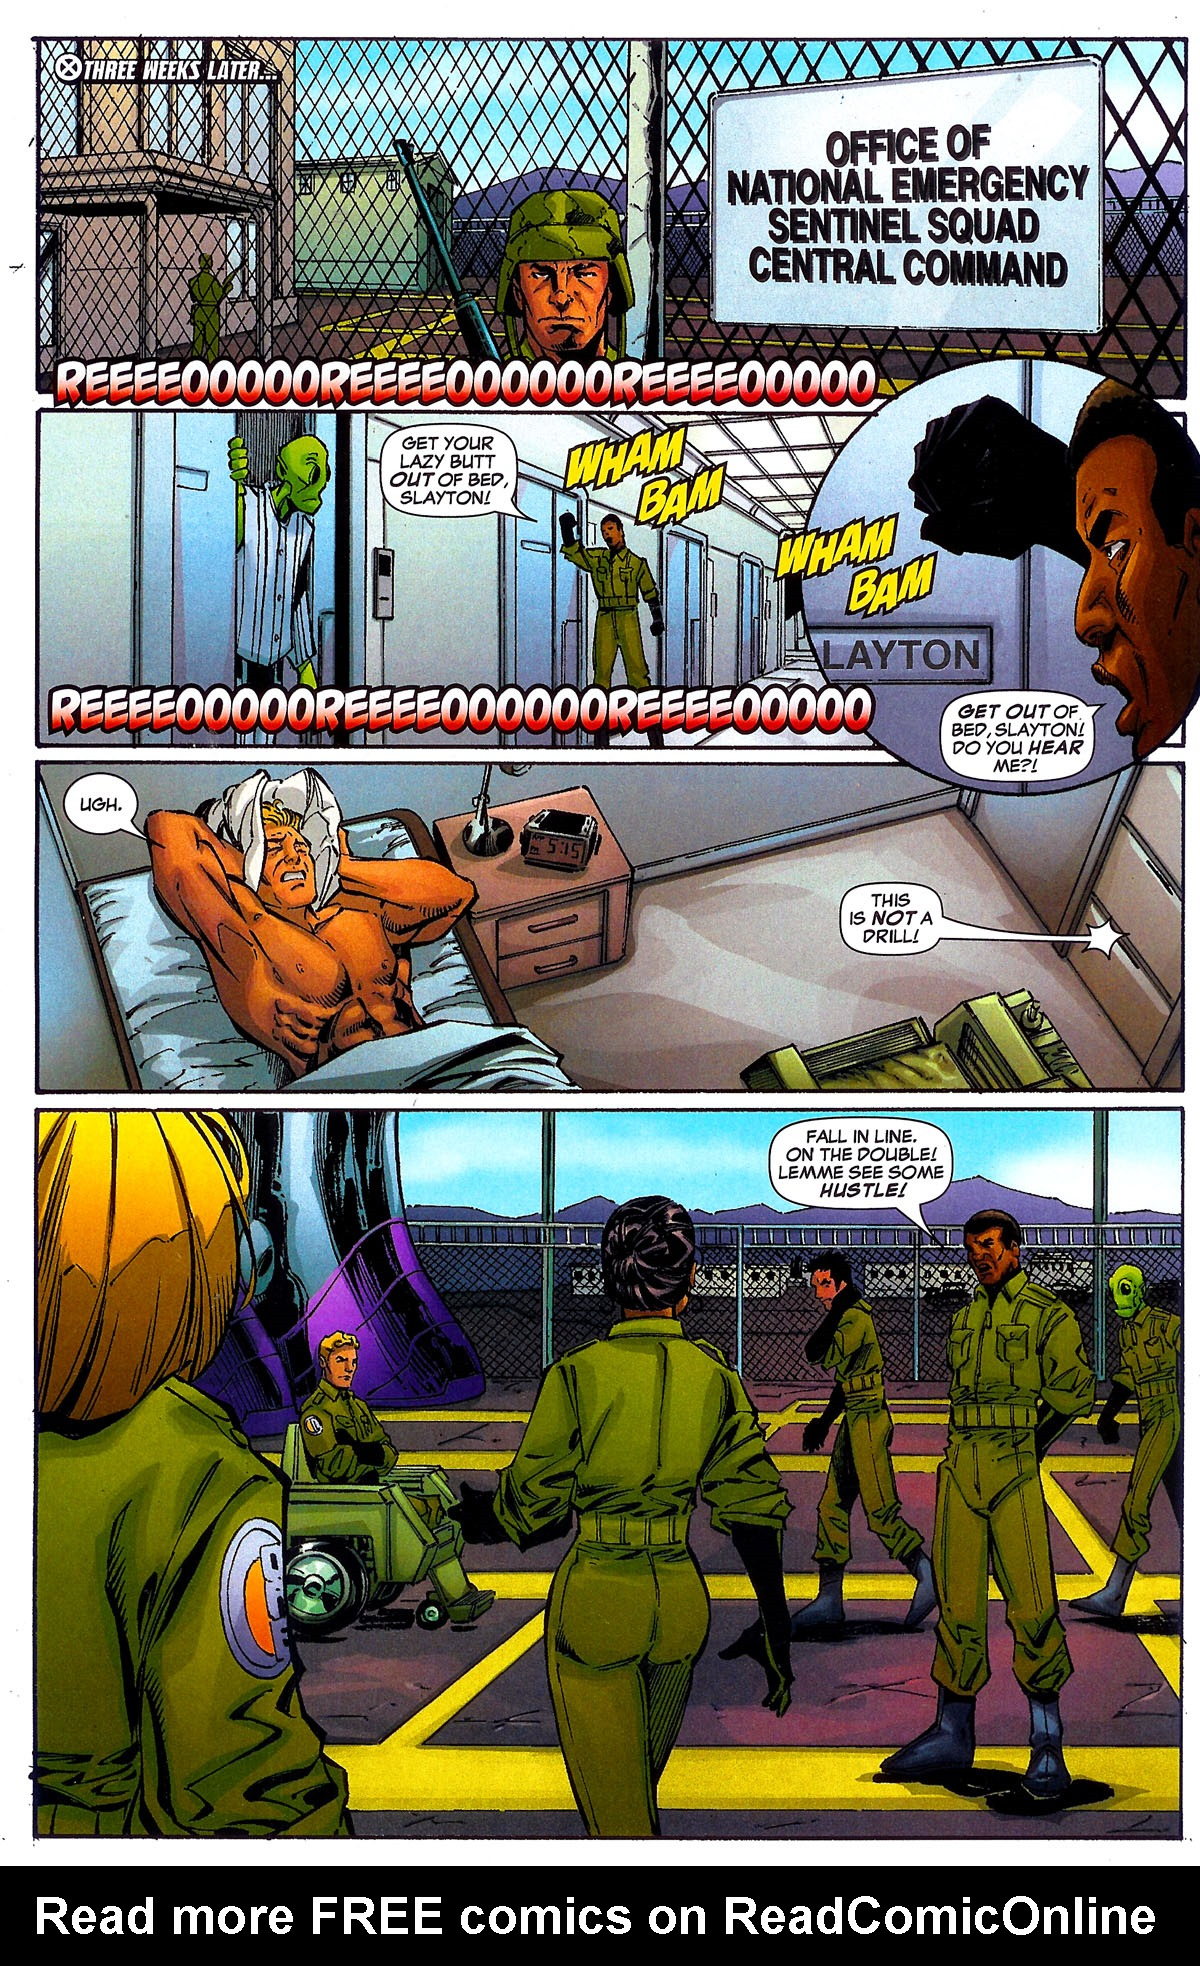 Read online Sentinel Squad O*N*E comic -  Issue #5 - 5